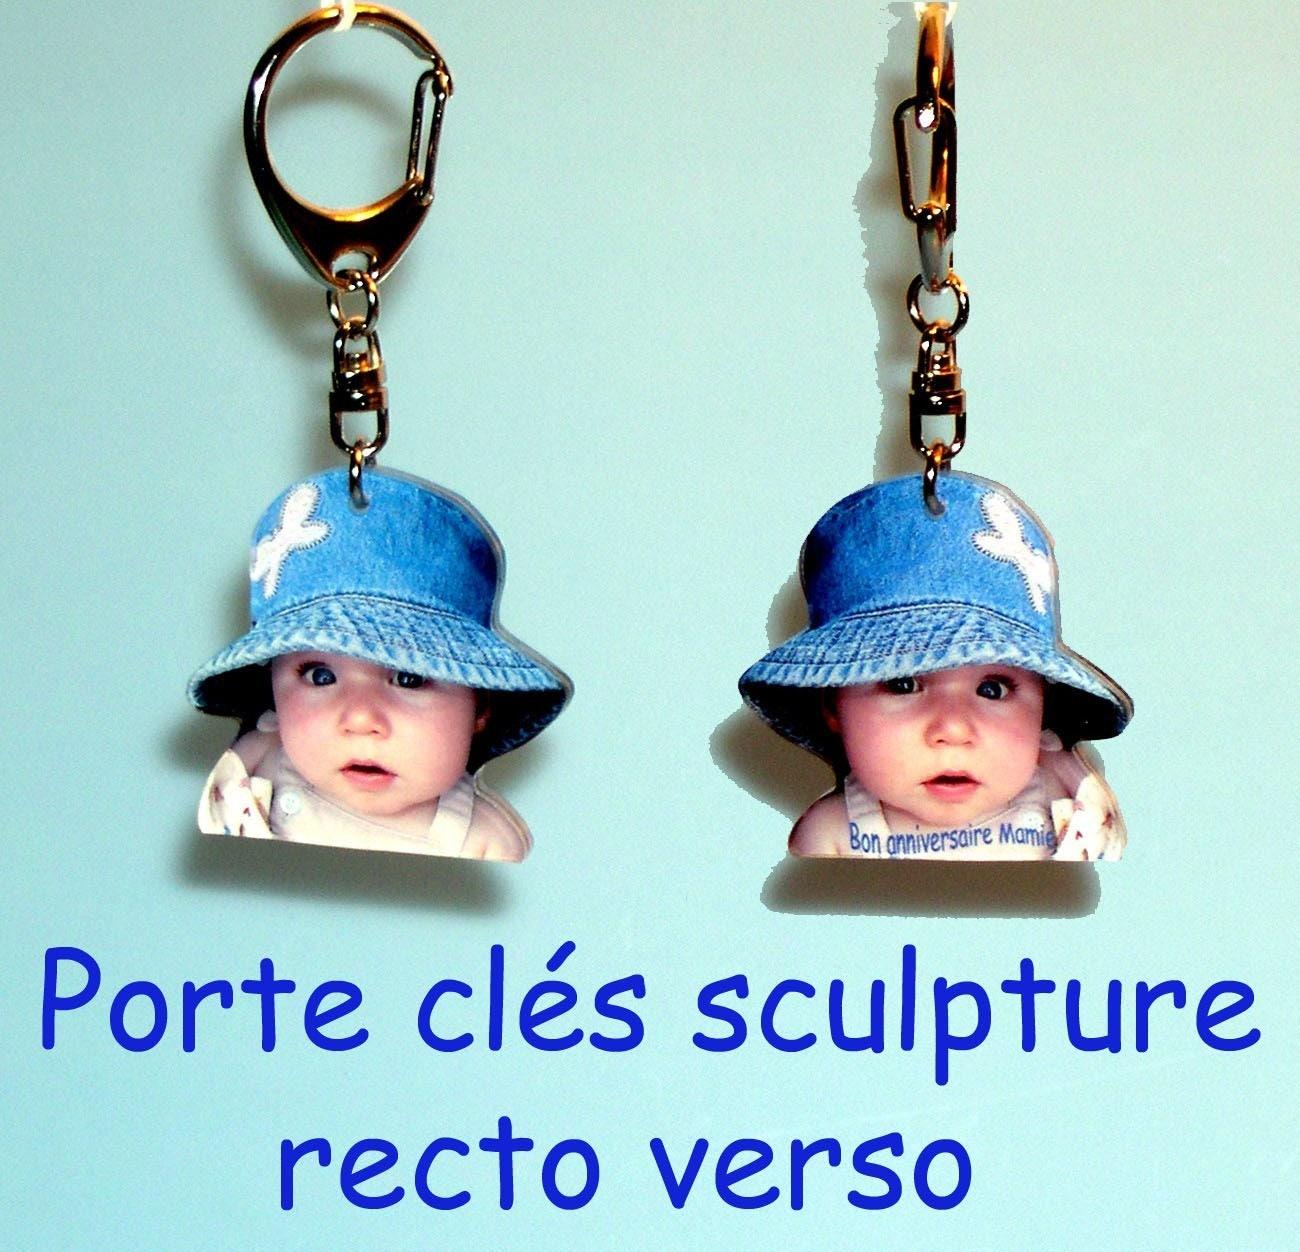 Porte cles sculpte recto verso avec 1 photo - Porte clef personnalise photo recto verso ...